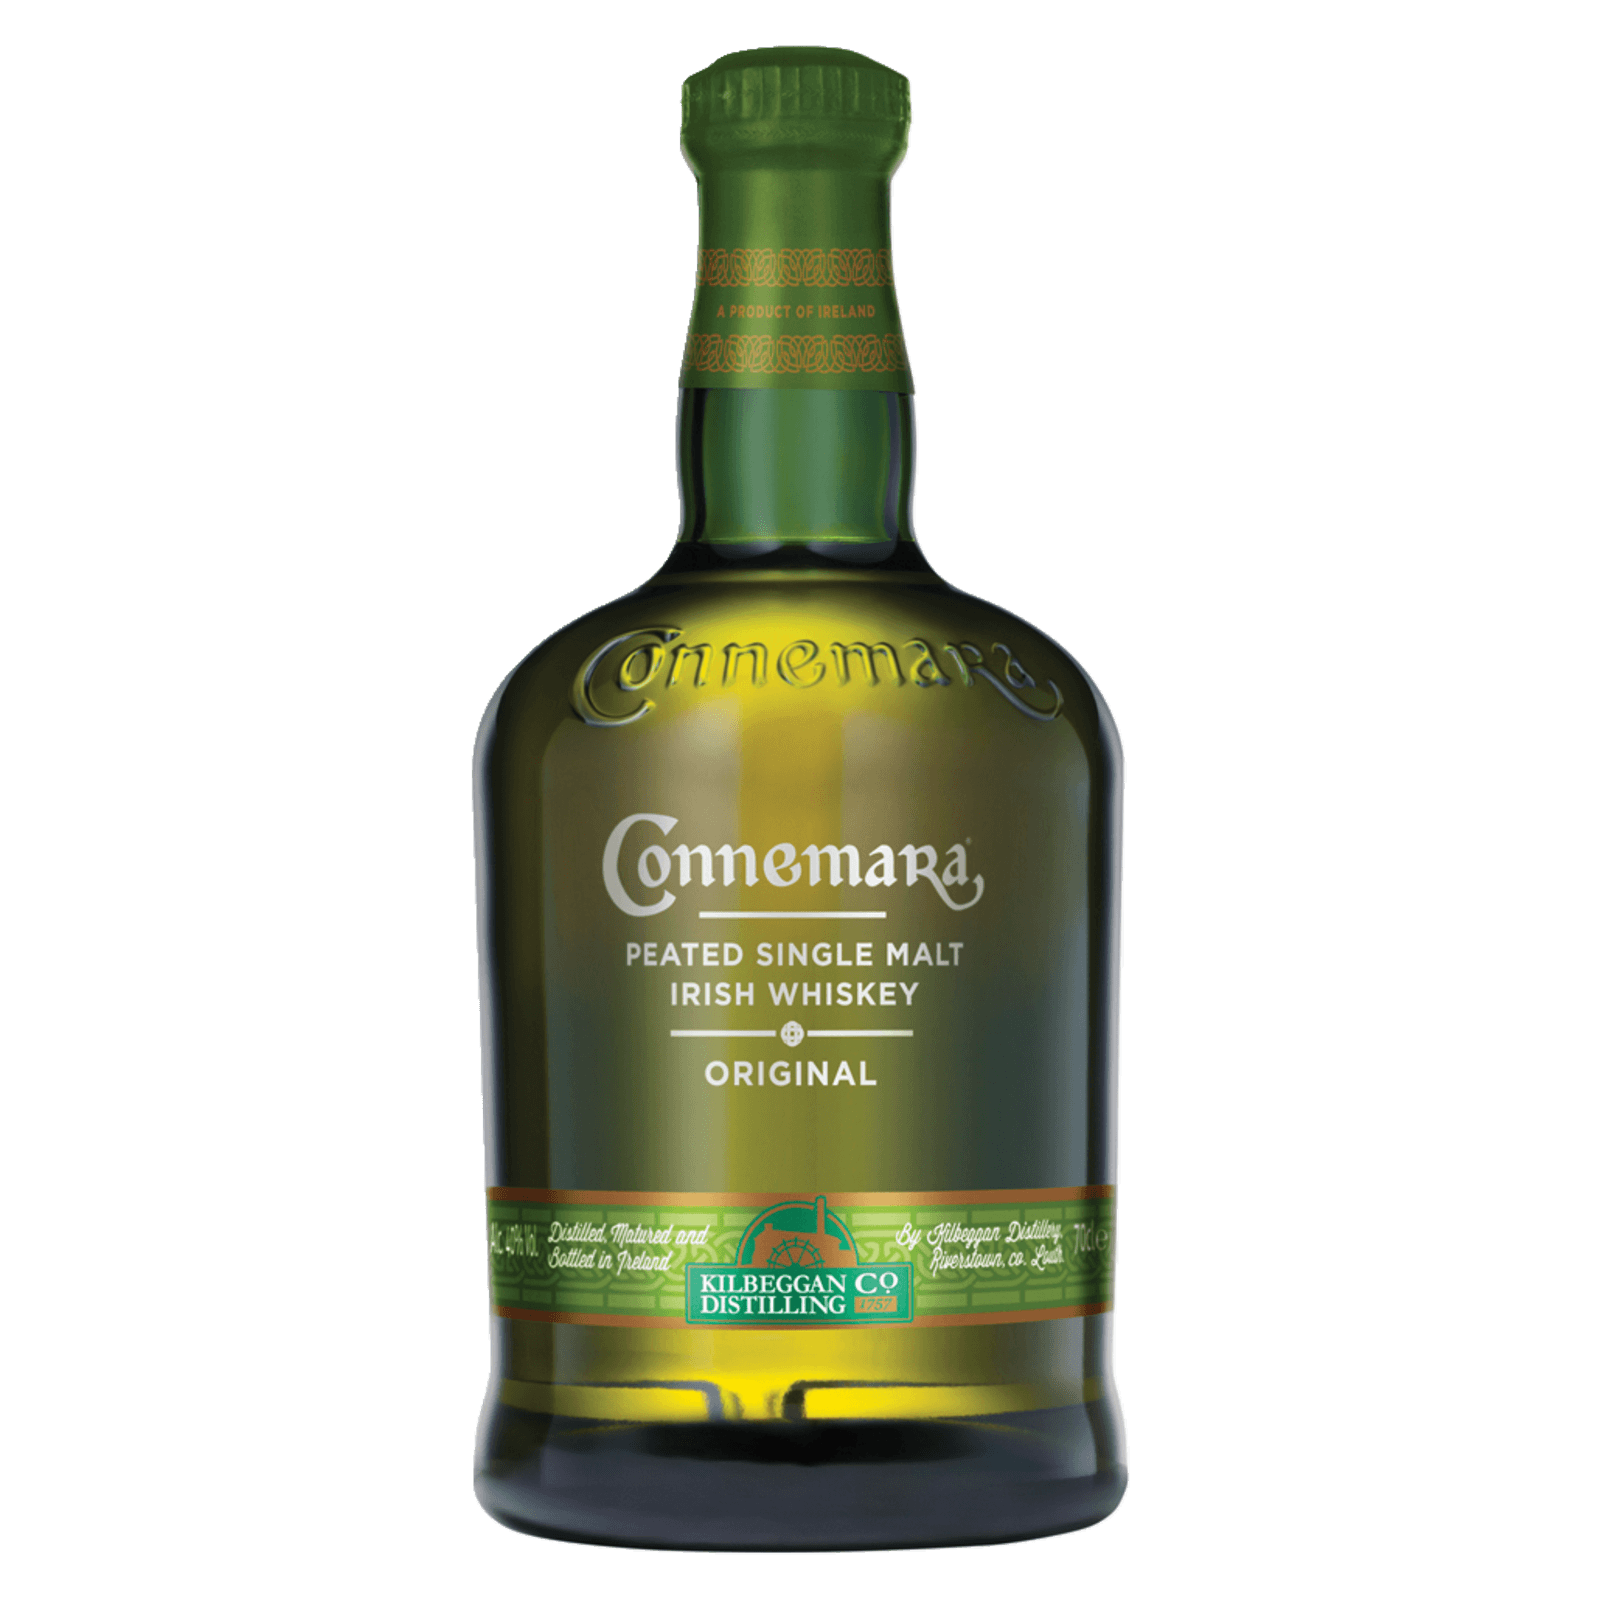 Connemara Peated Single Malt Irish Whiskey 0,7l bei REWE online ...